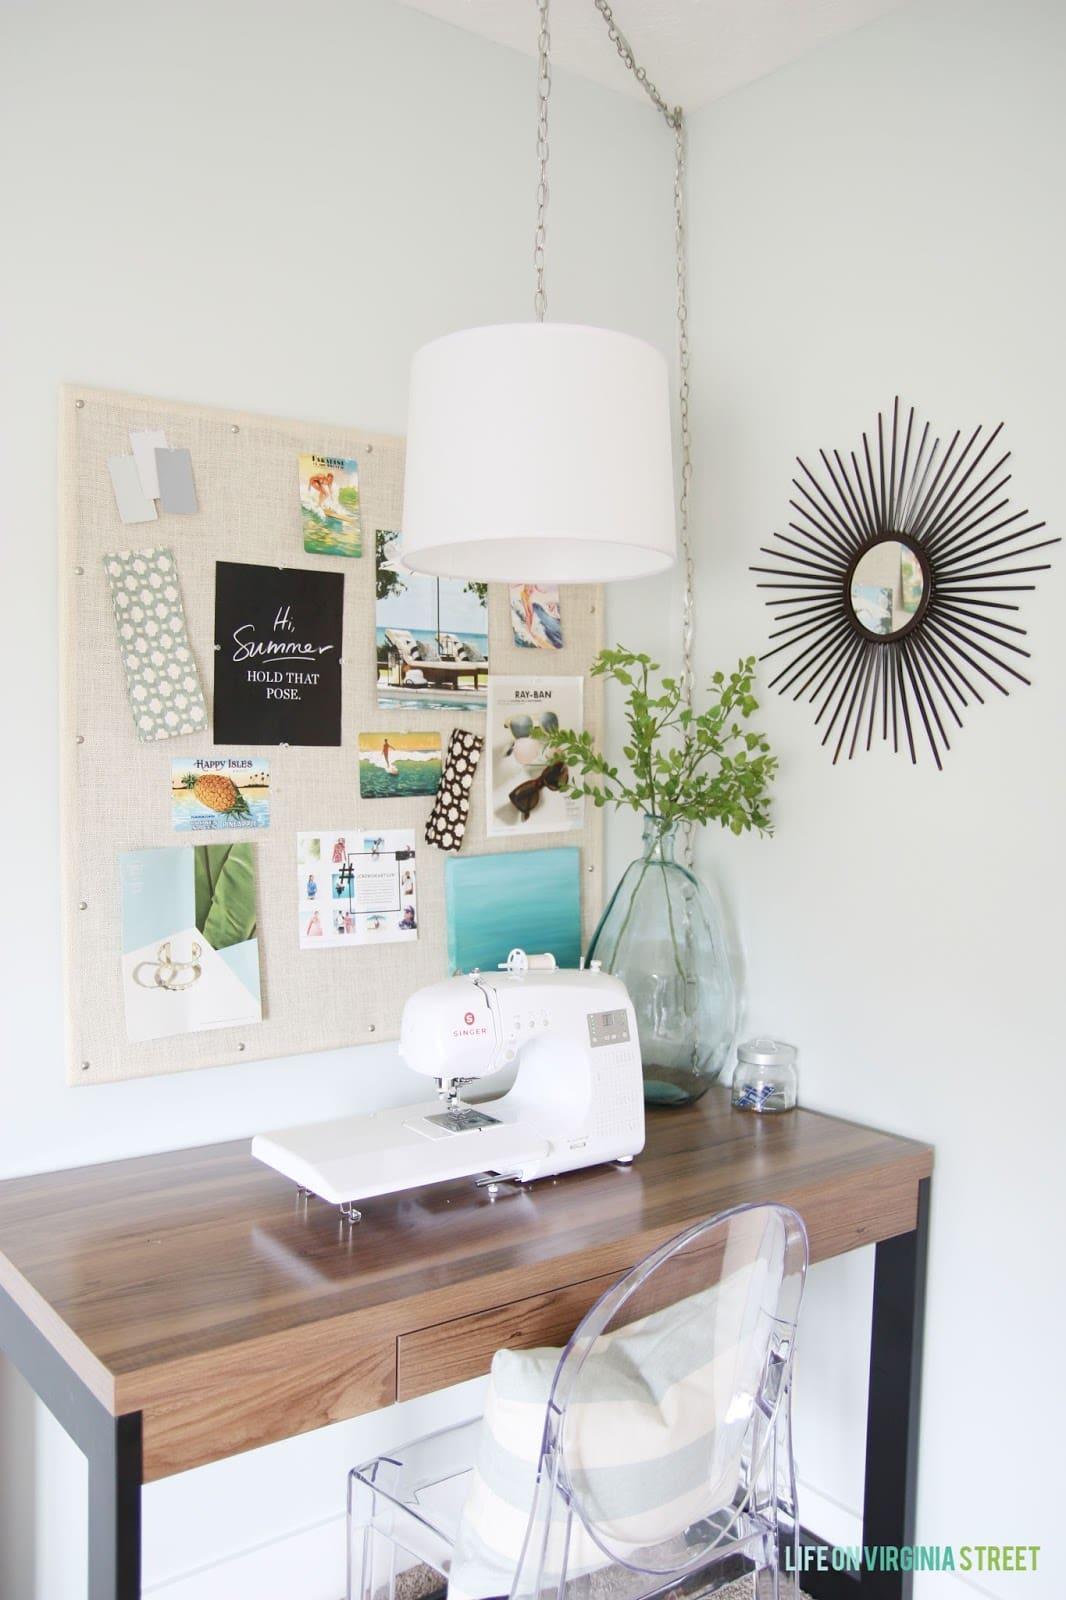 Craft room with walls painted Benjamin Moore Healing Aloe